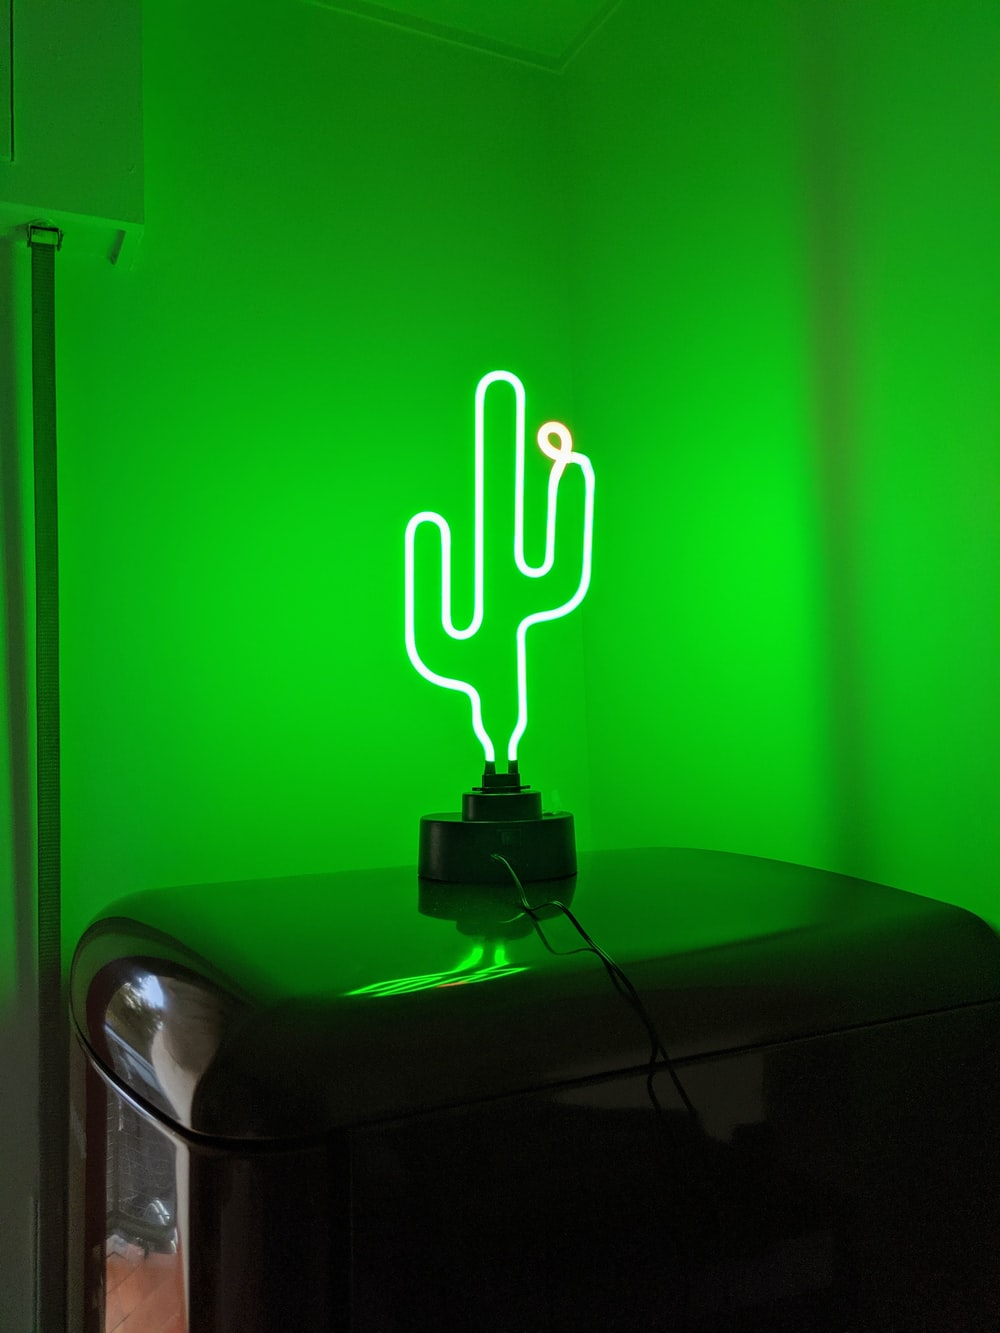 shallow focus photo of green cactus neon light